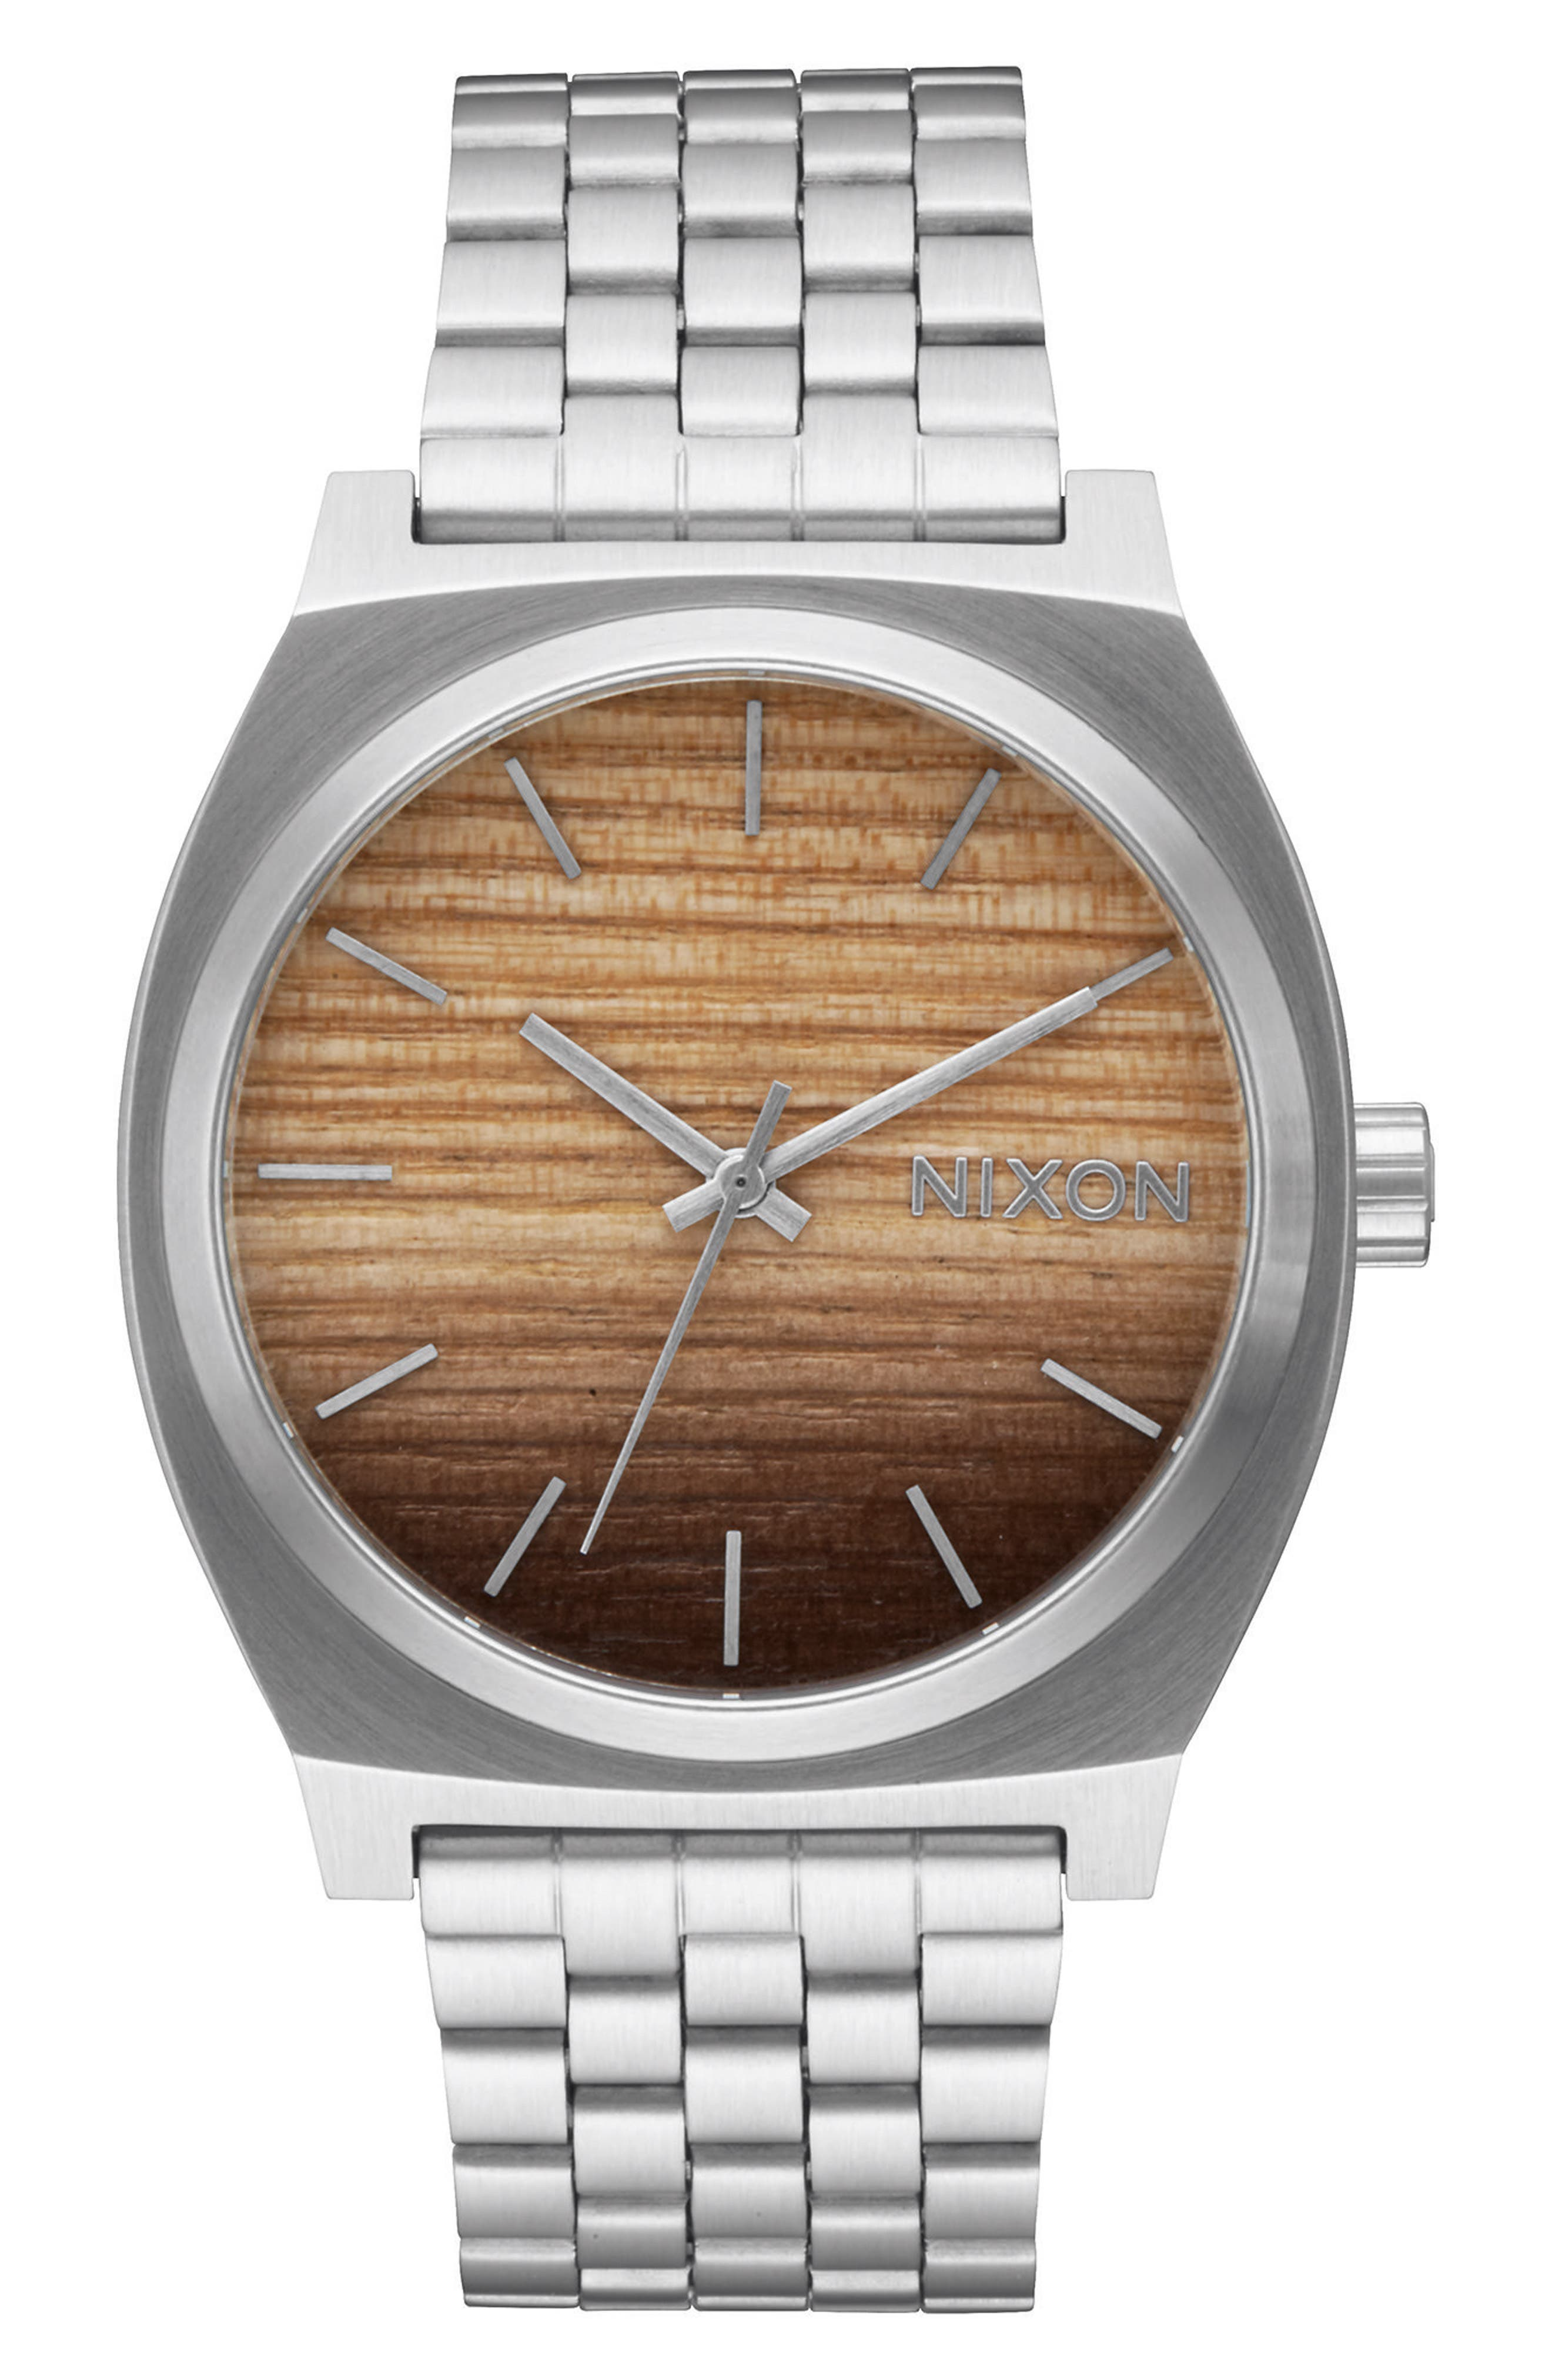 Nixon Time Teller Bracelet Watch, 37mm